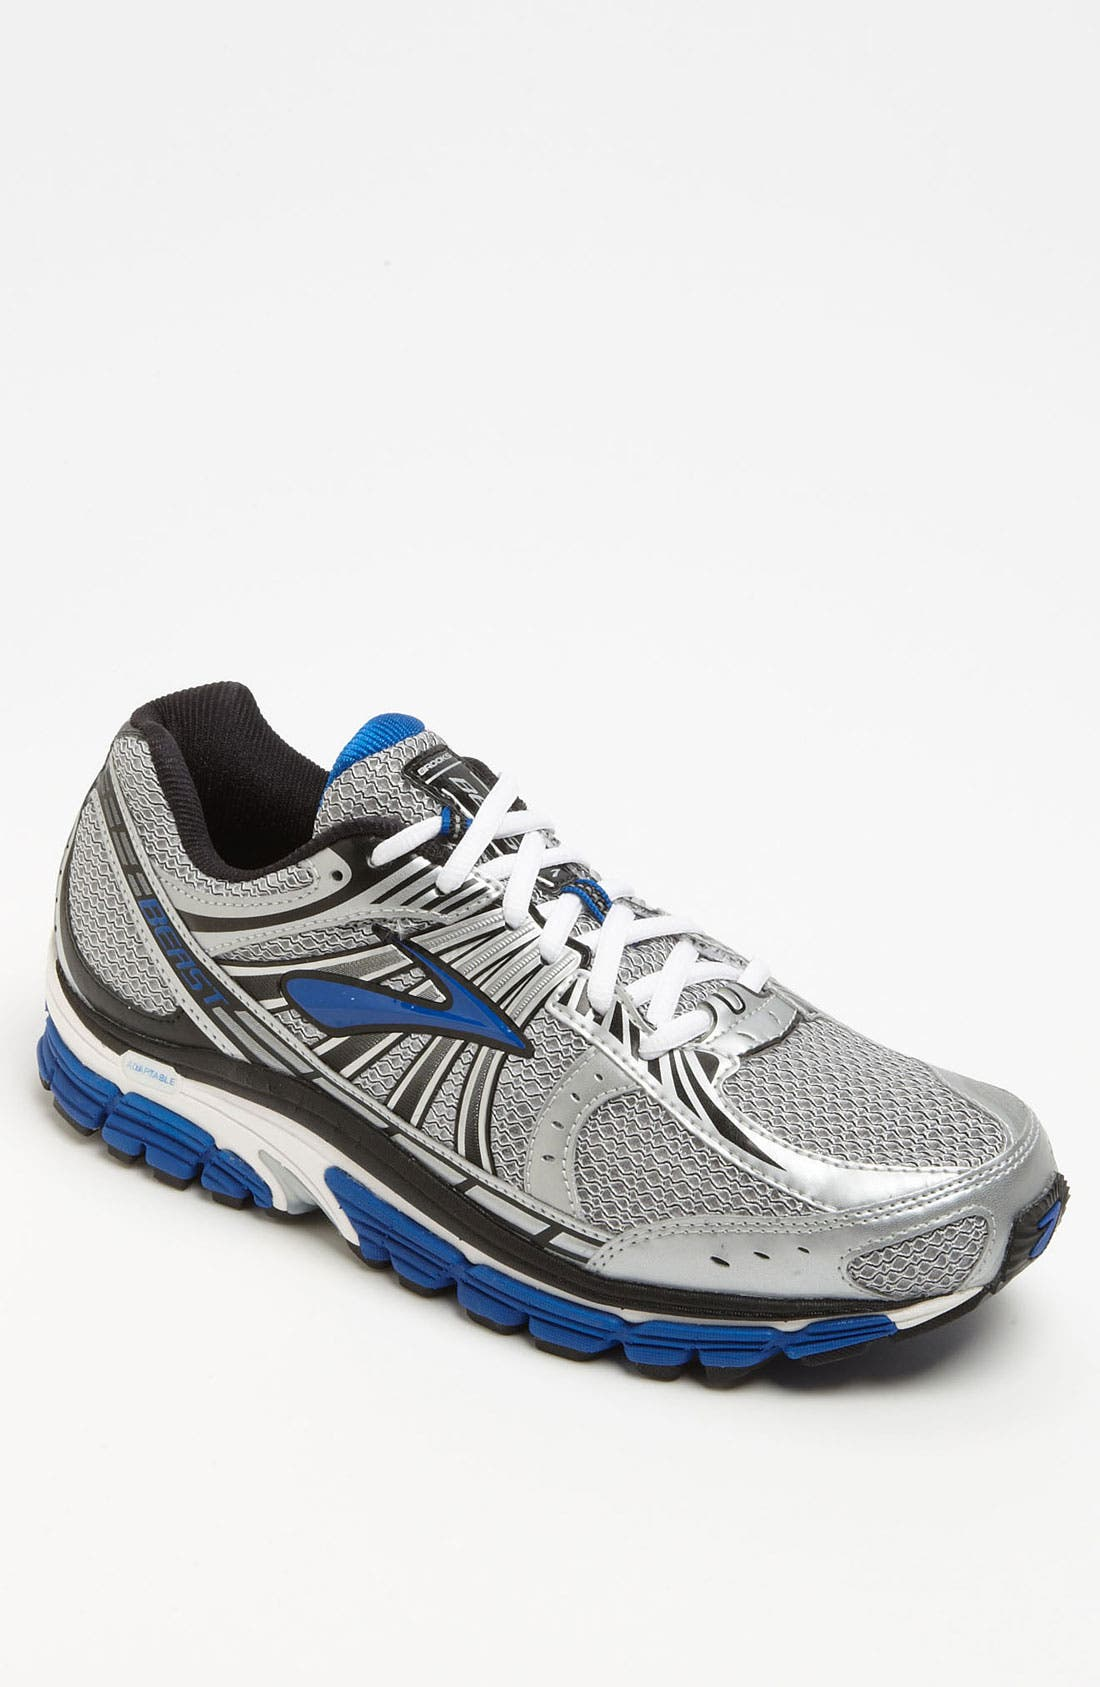 Main Image - Brooks 'Beast' Running Shoe (Men) (Regular Retail Price: $139.95)